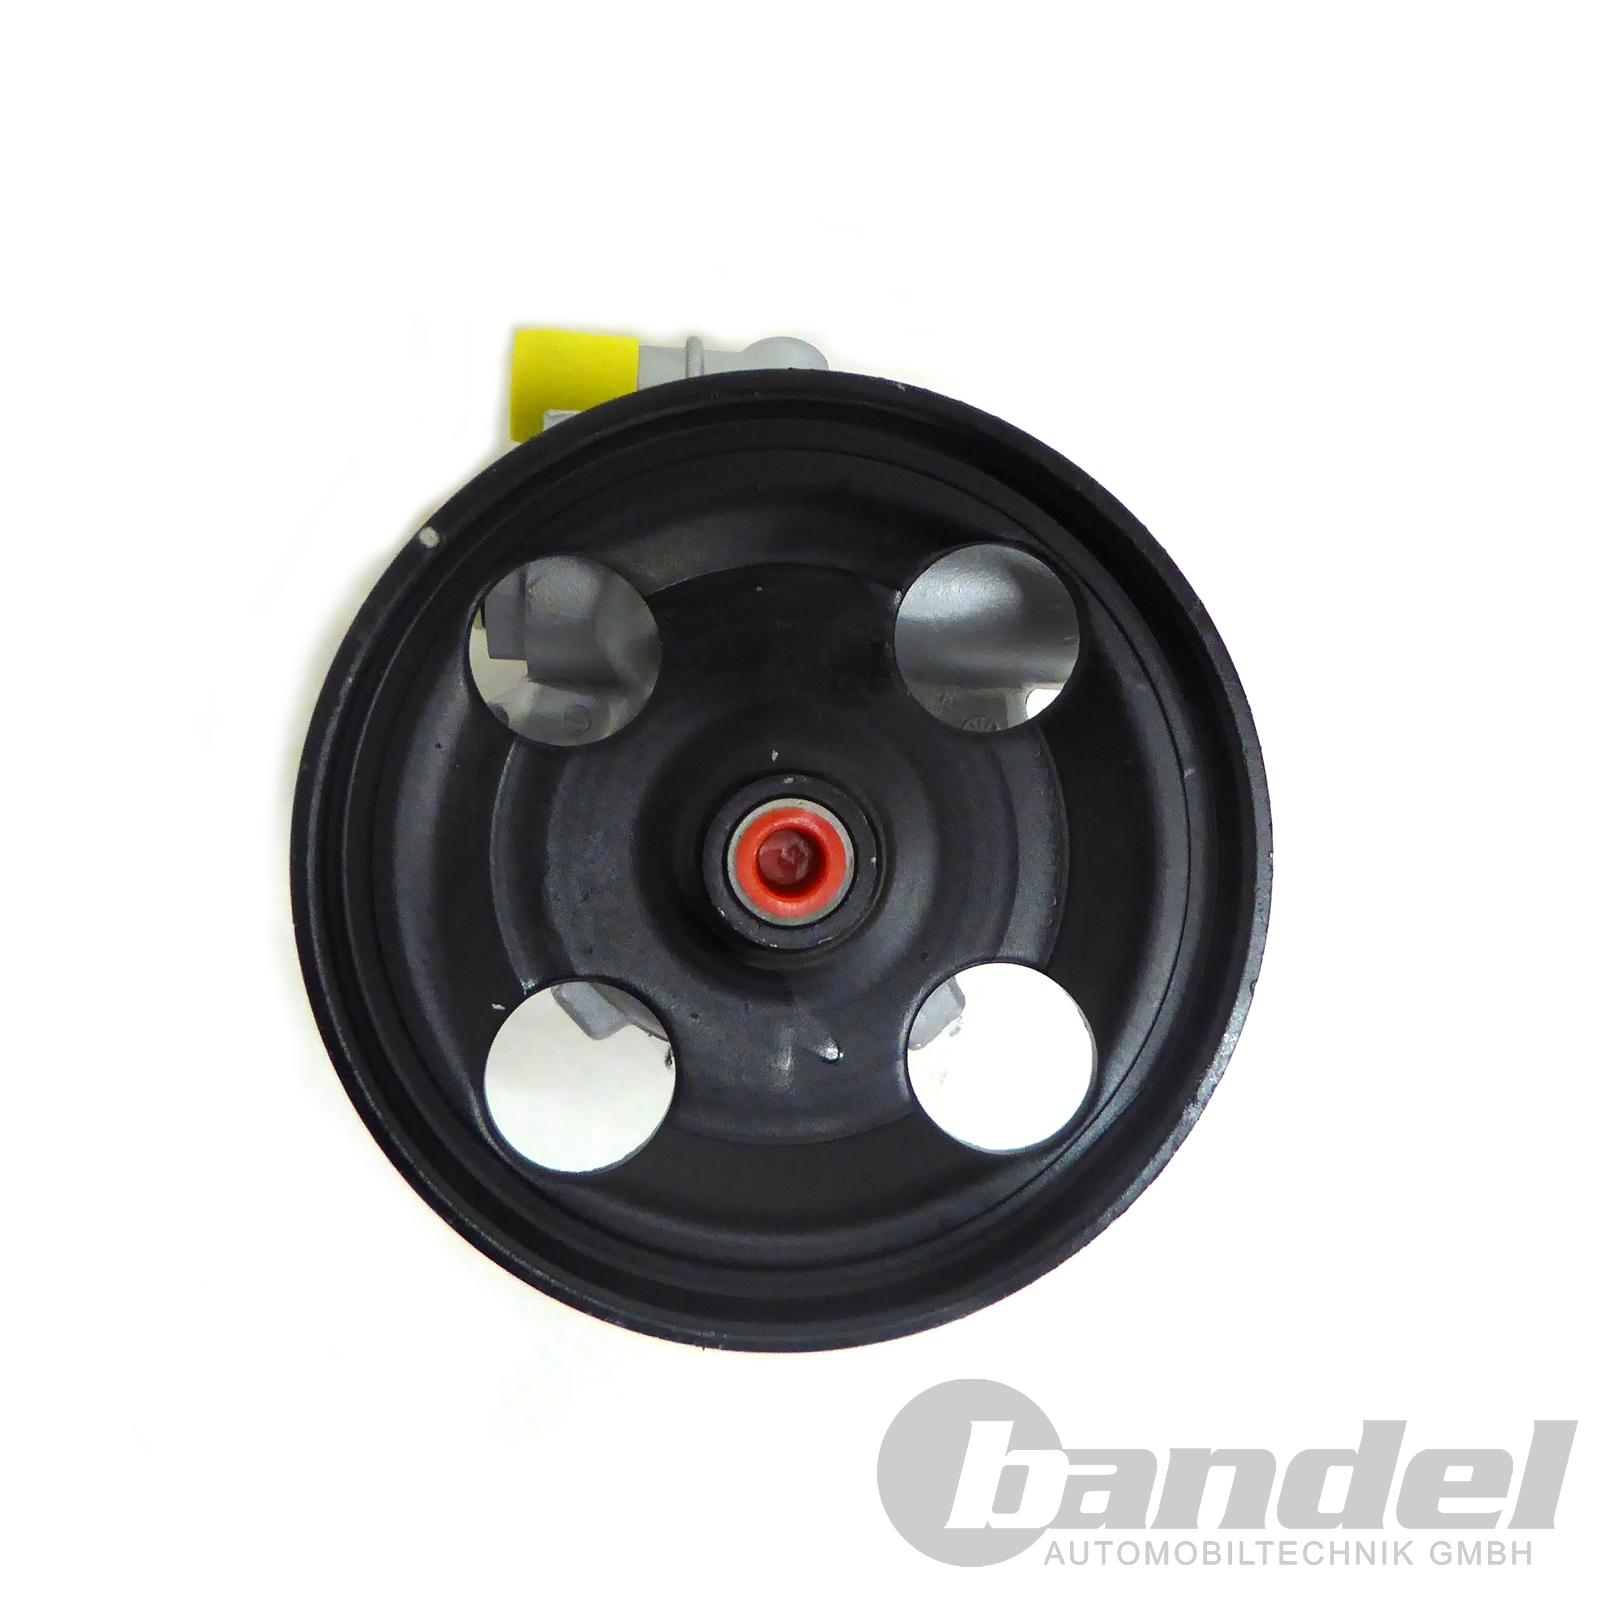 servopumpe hydraulisch citroen c8 peugeot 807 lancia phedra 126mm ebay. Black Bedroom Furniture Sets. Home Design Ideas